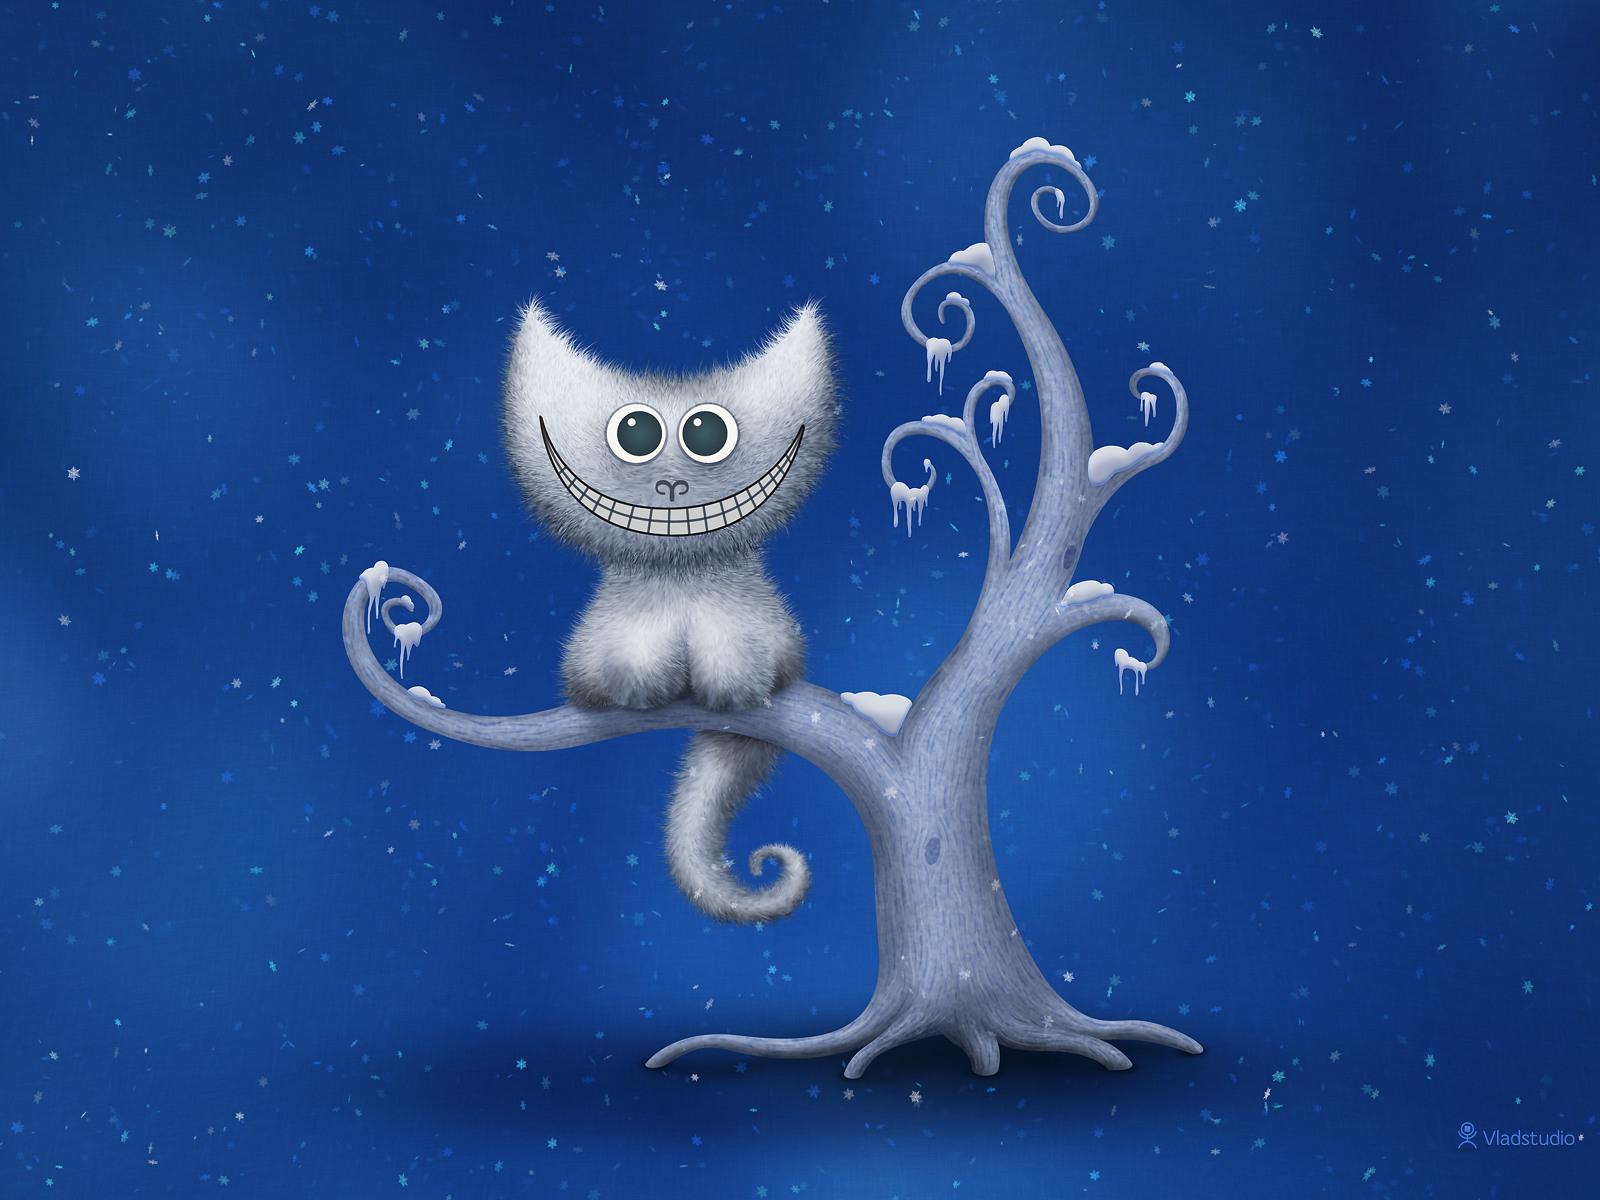 A Cheshire Kitten - Christmas